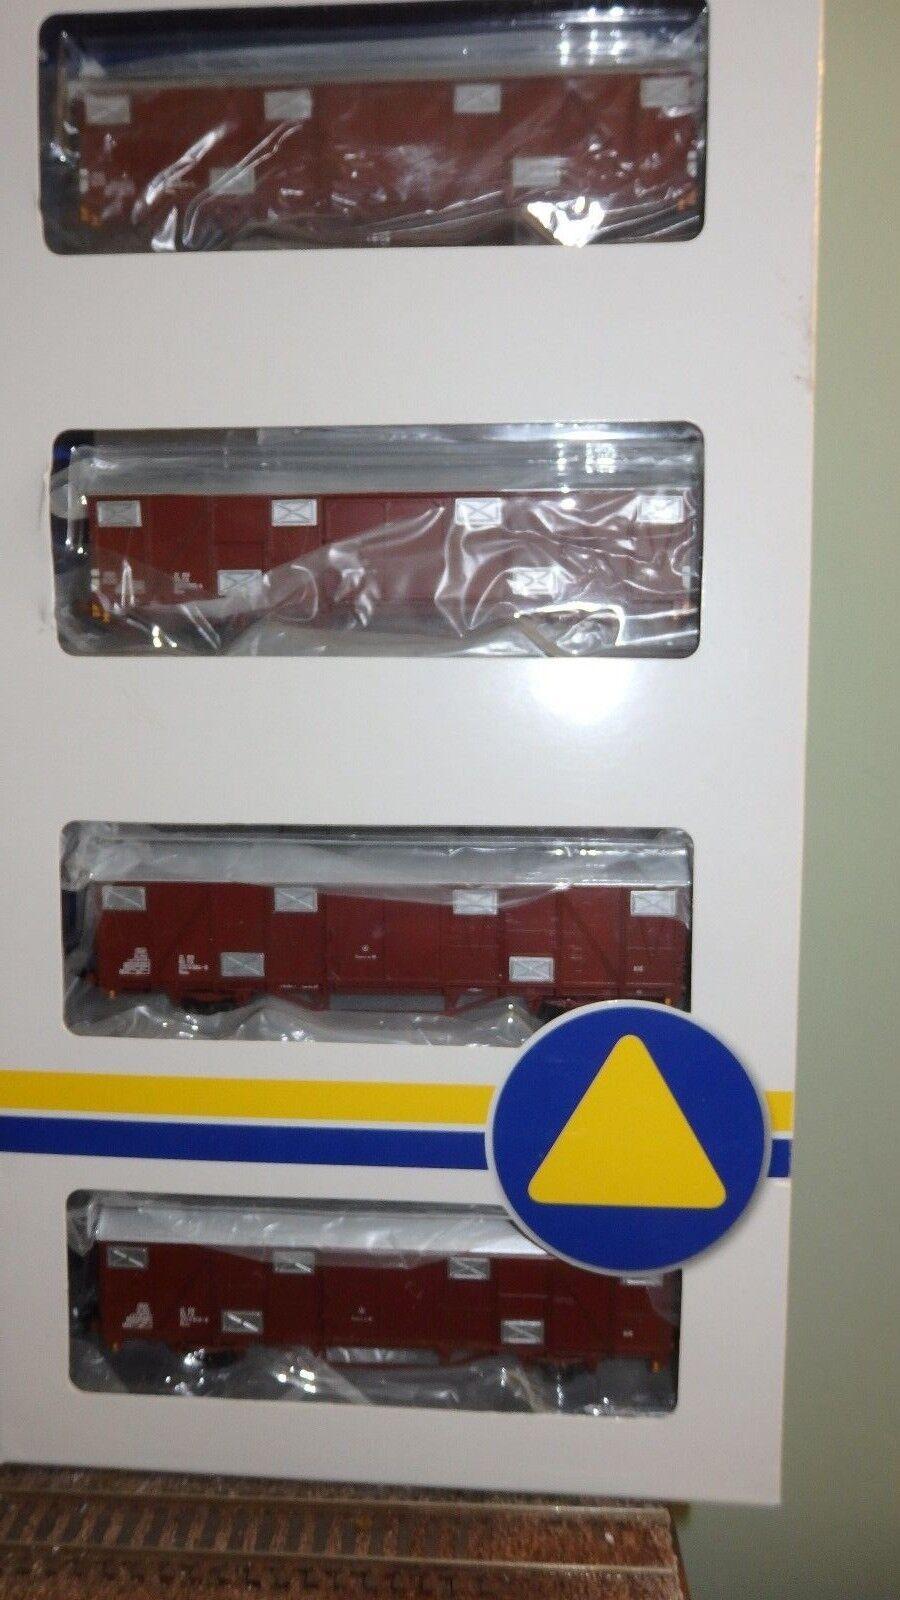 OS.KAR 4220 Set di 4 carri FS 2 assi, 2 Hbchs e 2  Gbhqs con REC, livrea braune